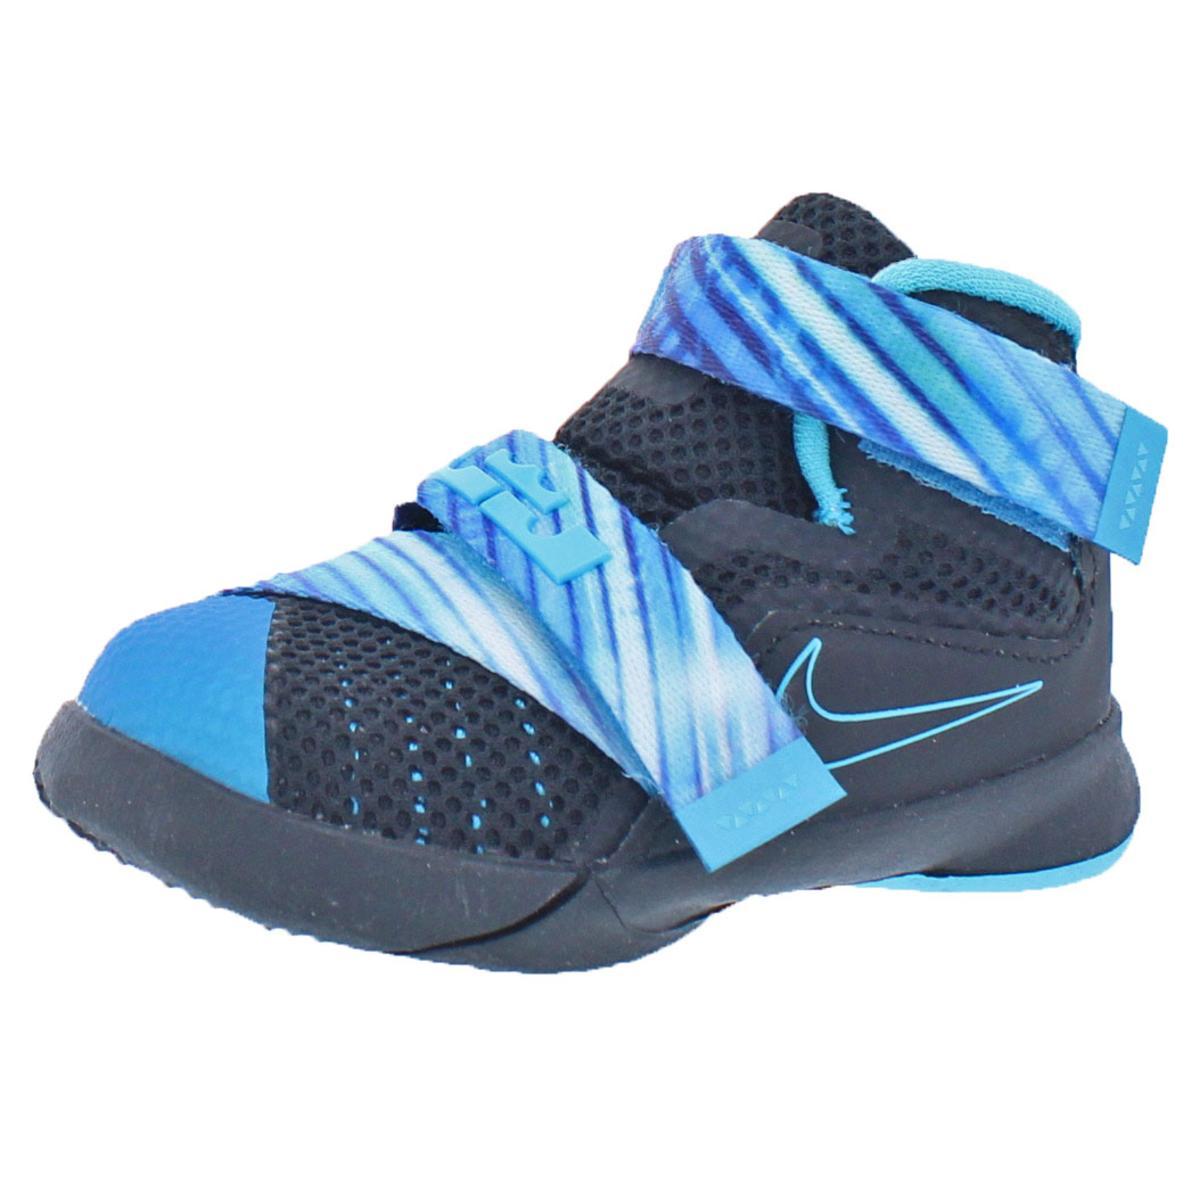 7583e7358b5 Details about Nike Boys LeBron Soldier IX Black Basketball Shoes 4 Medium  (D) Toddler 2384